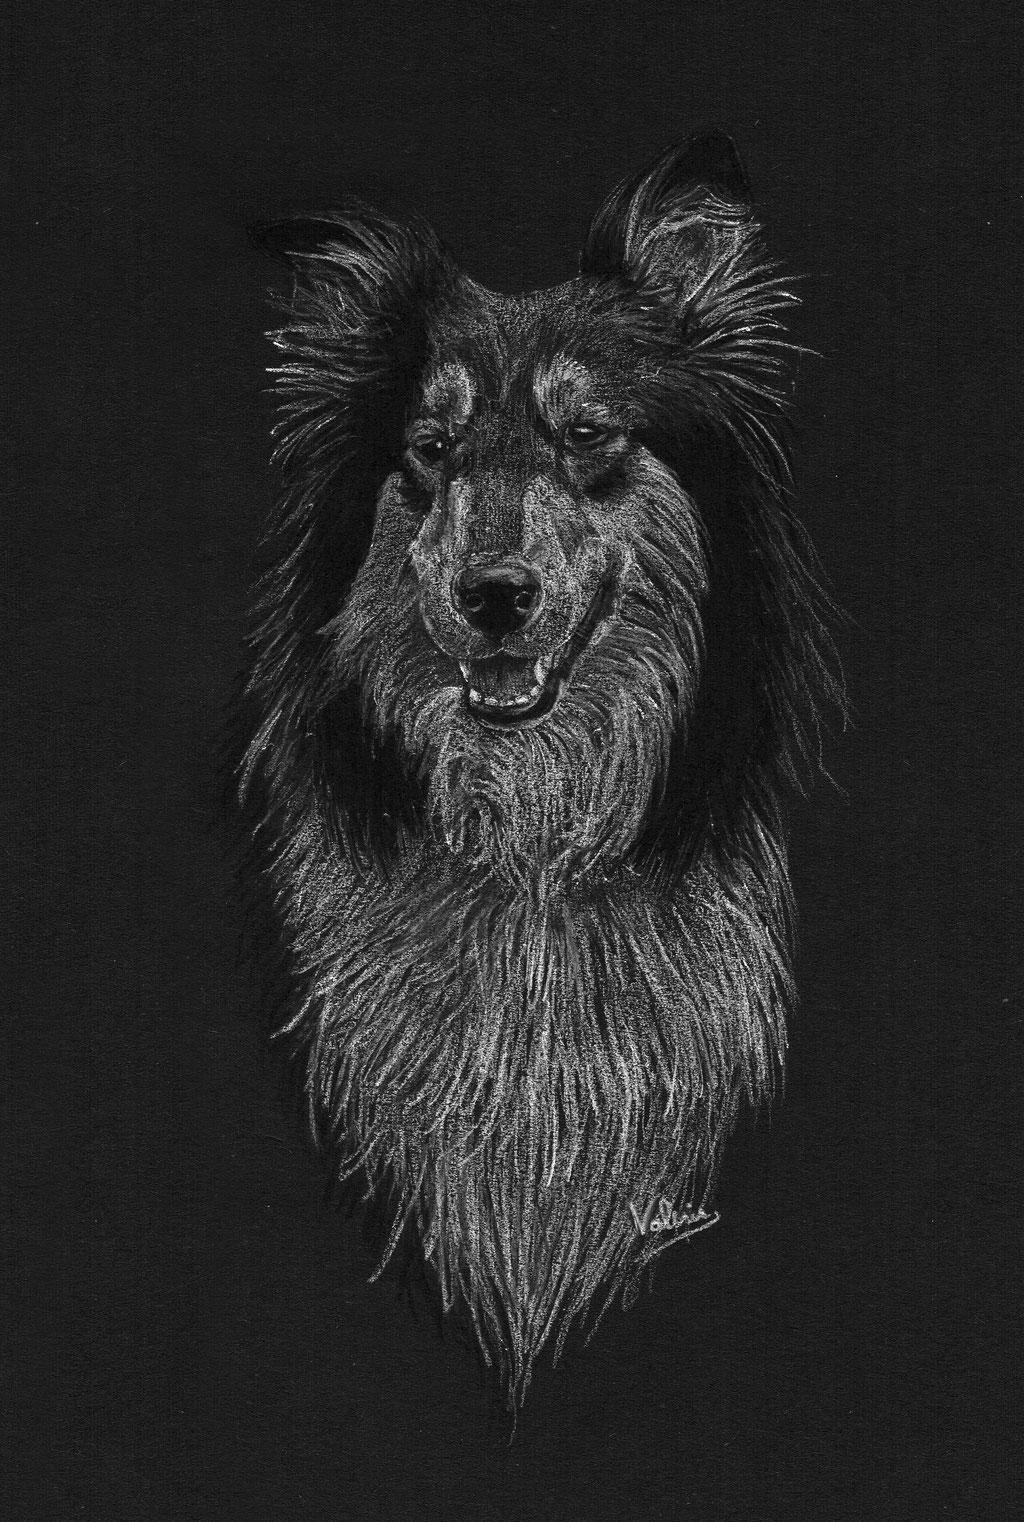 Dierenportret collie: Wit potlood en houtskool op zwart papier (2017)